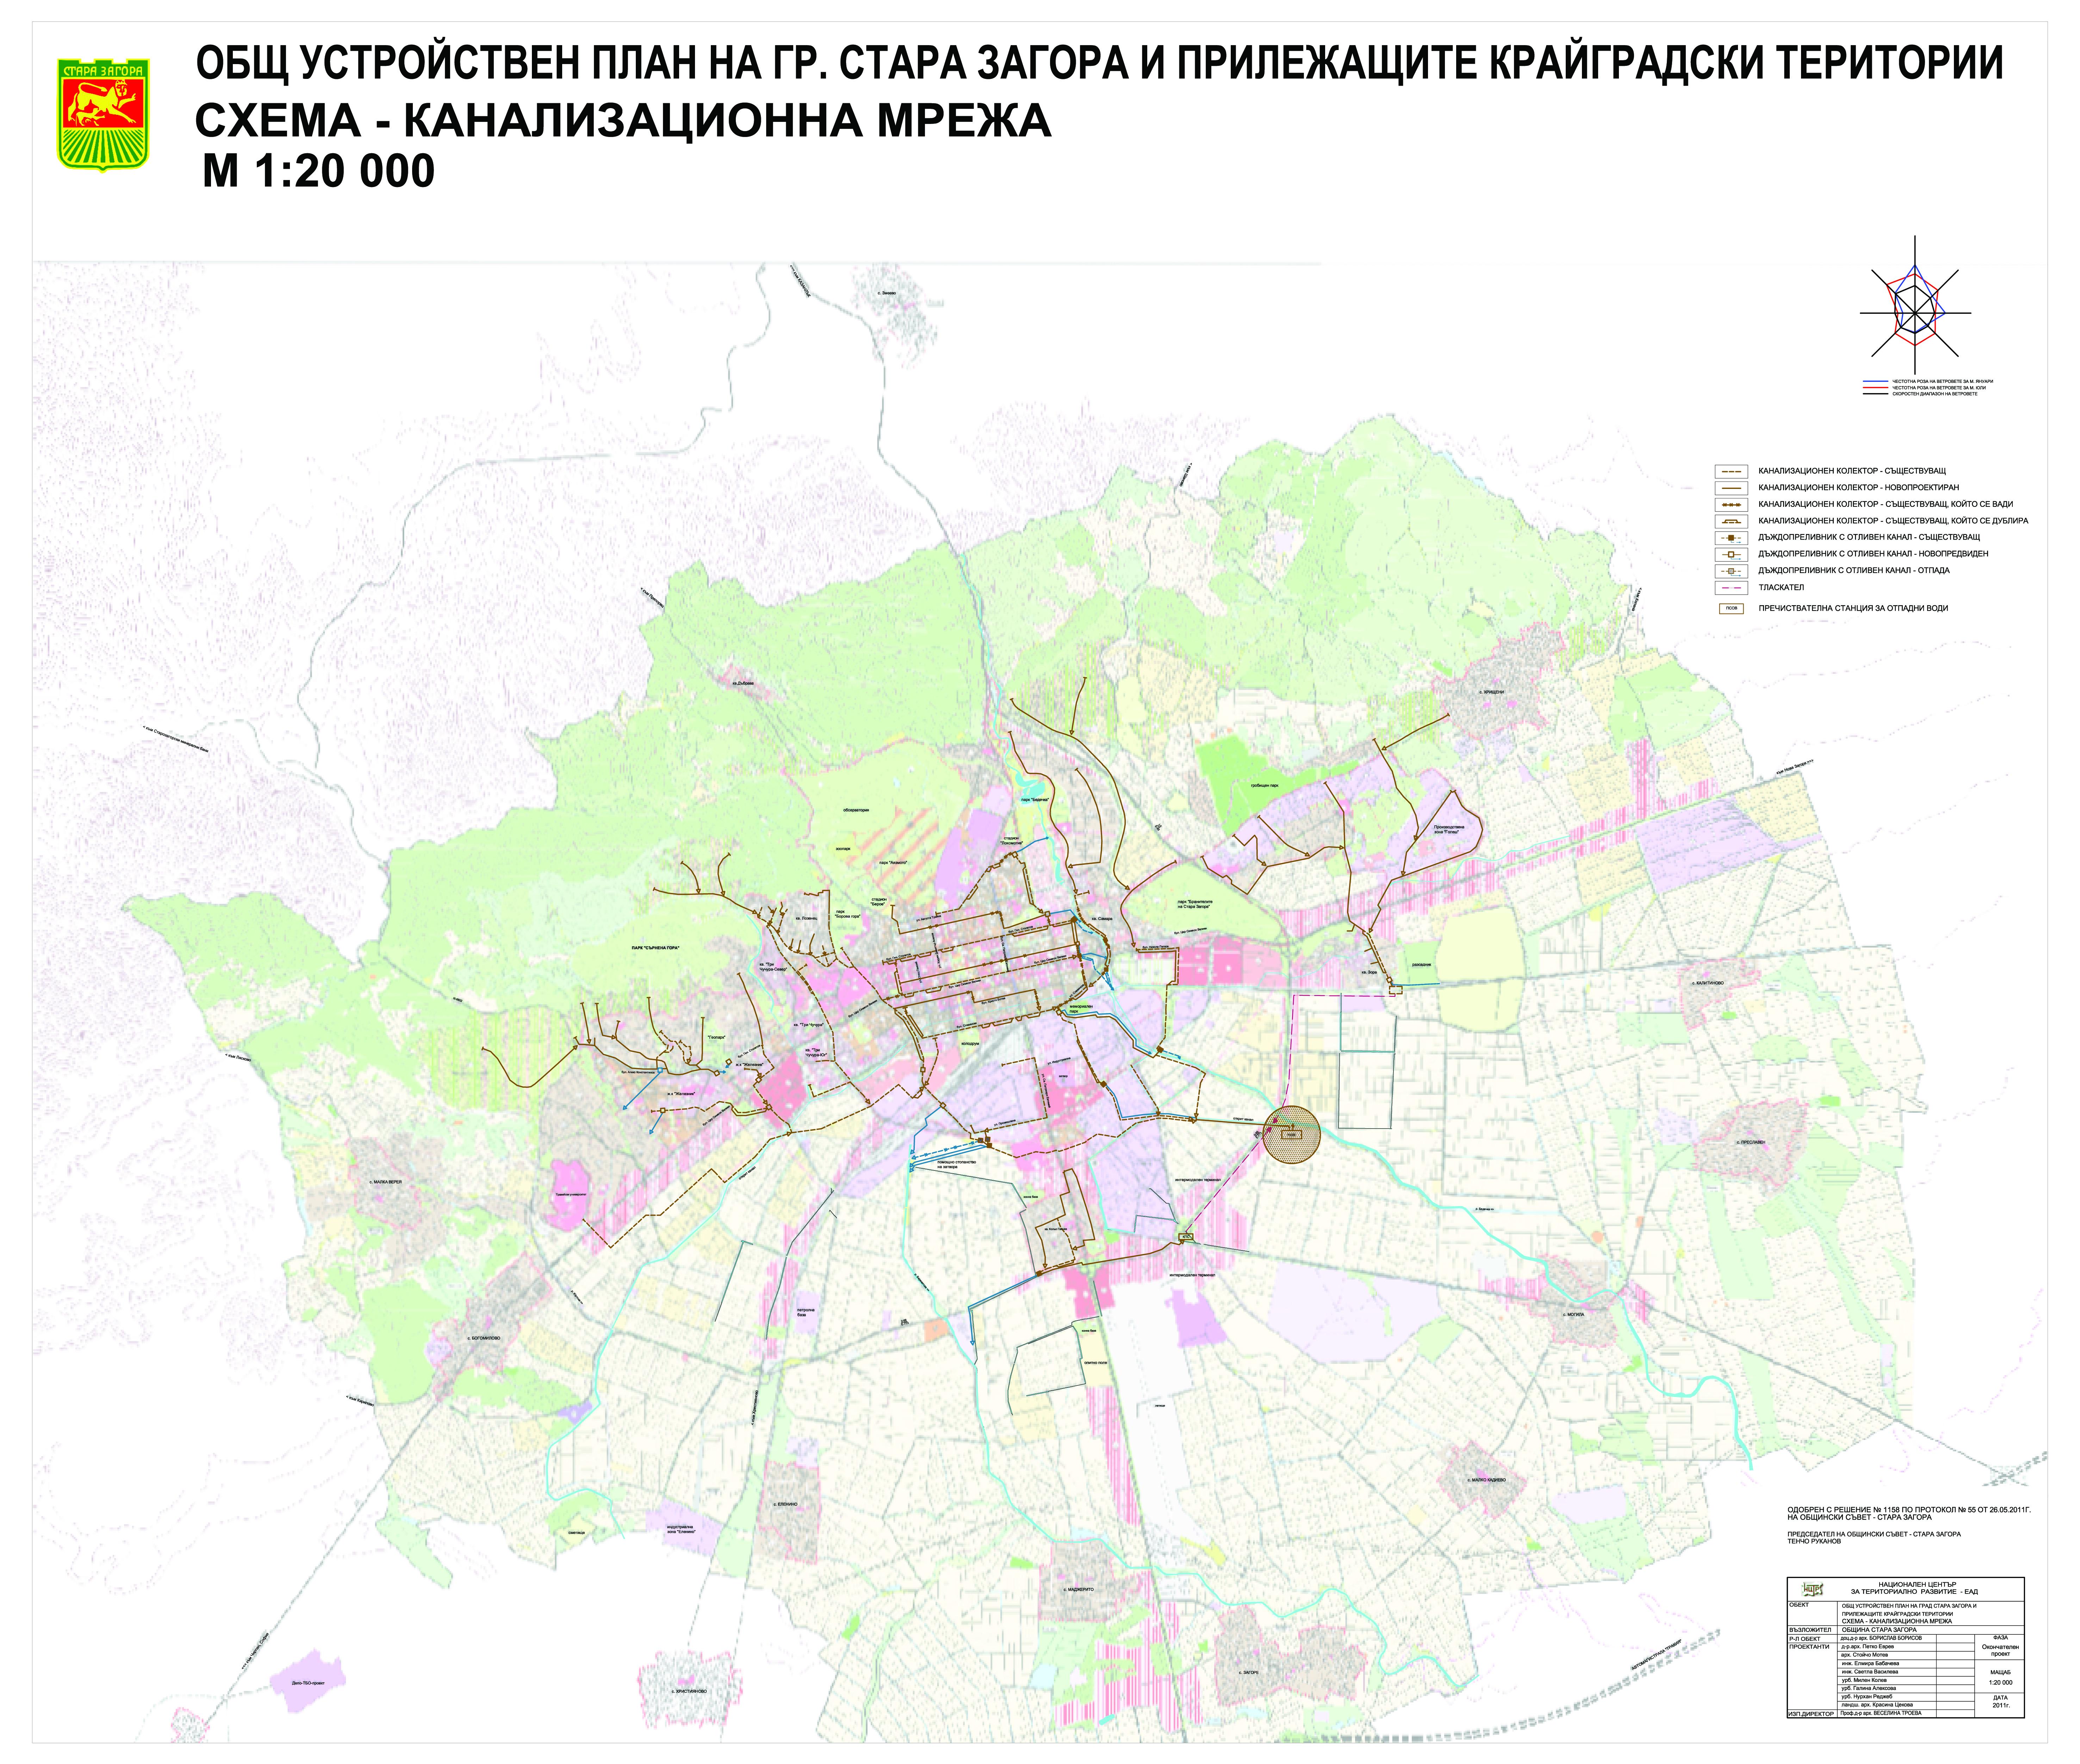 Obsh Ustrojstven Plan Obshina Stara Zagora